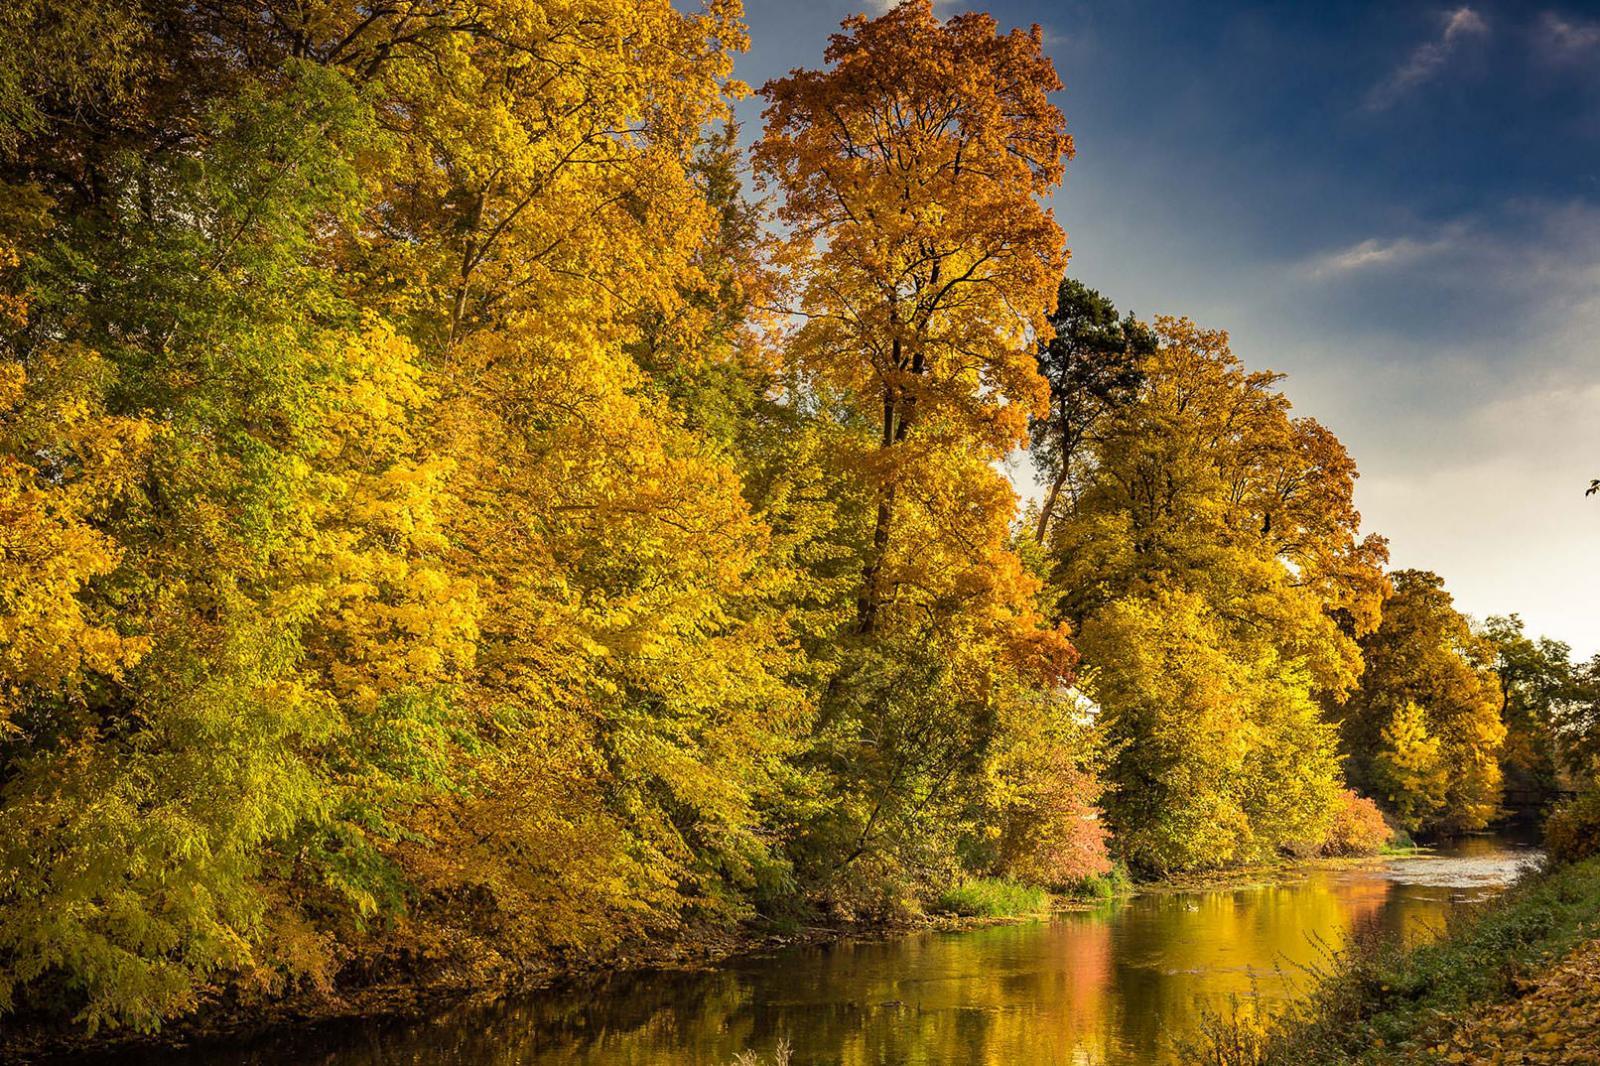 Herbst-Fotografie, Fotoshooting Waldrand mit Fluss